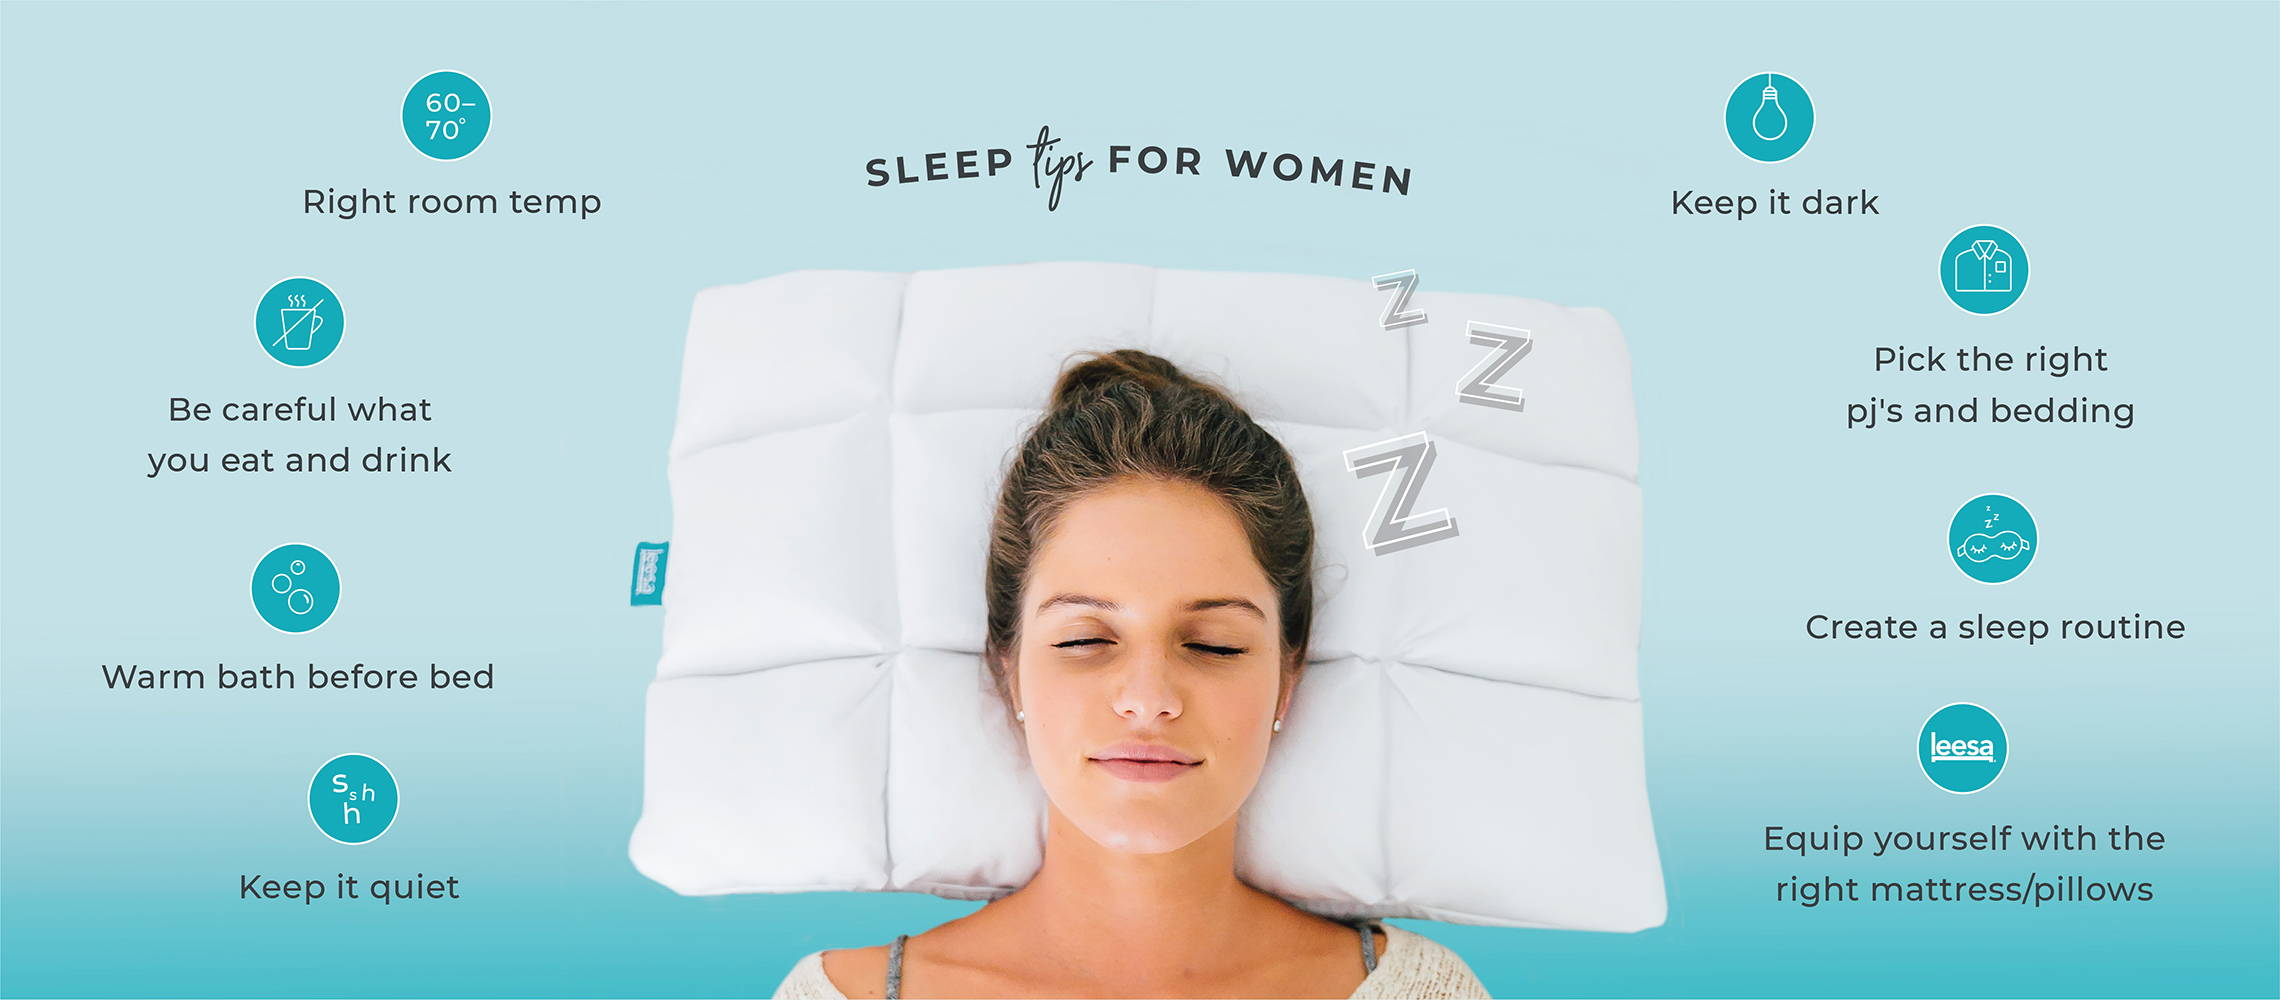 Sleep tips for women